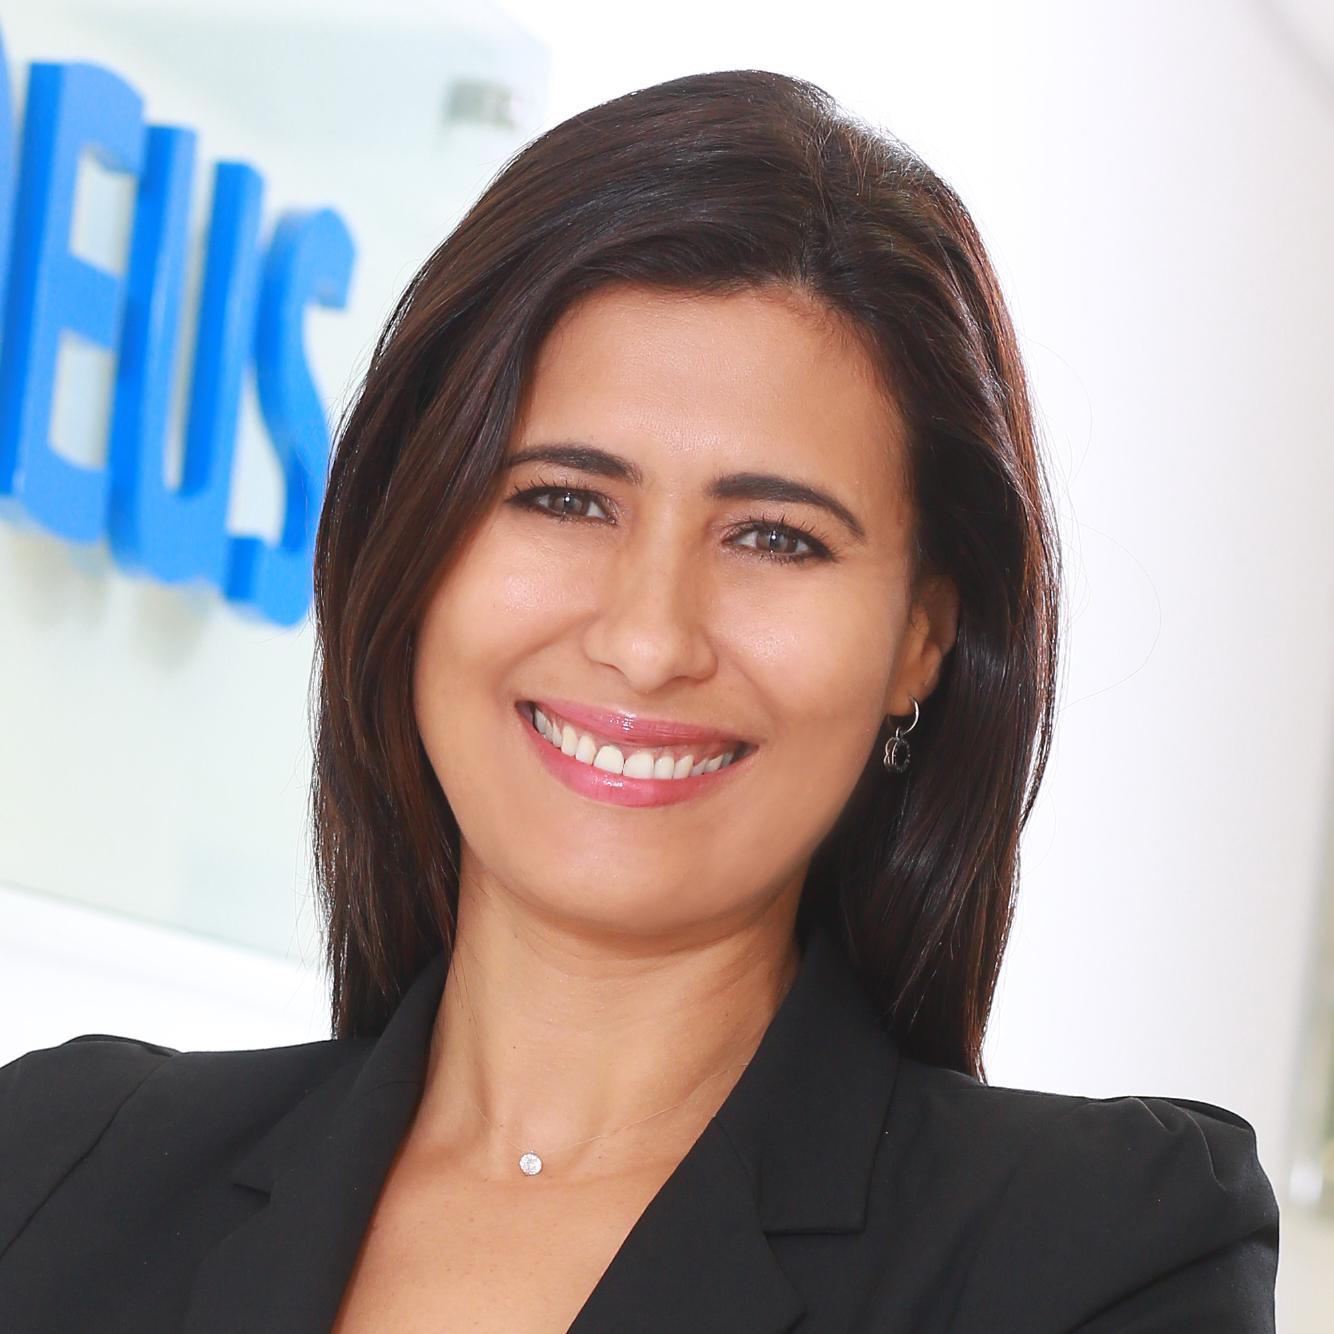 Nadia Yahiaoui